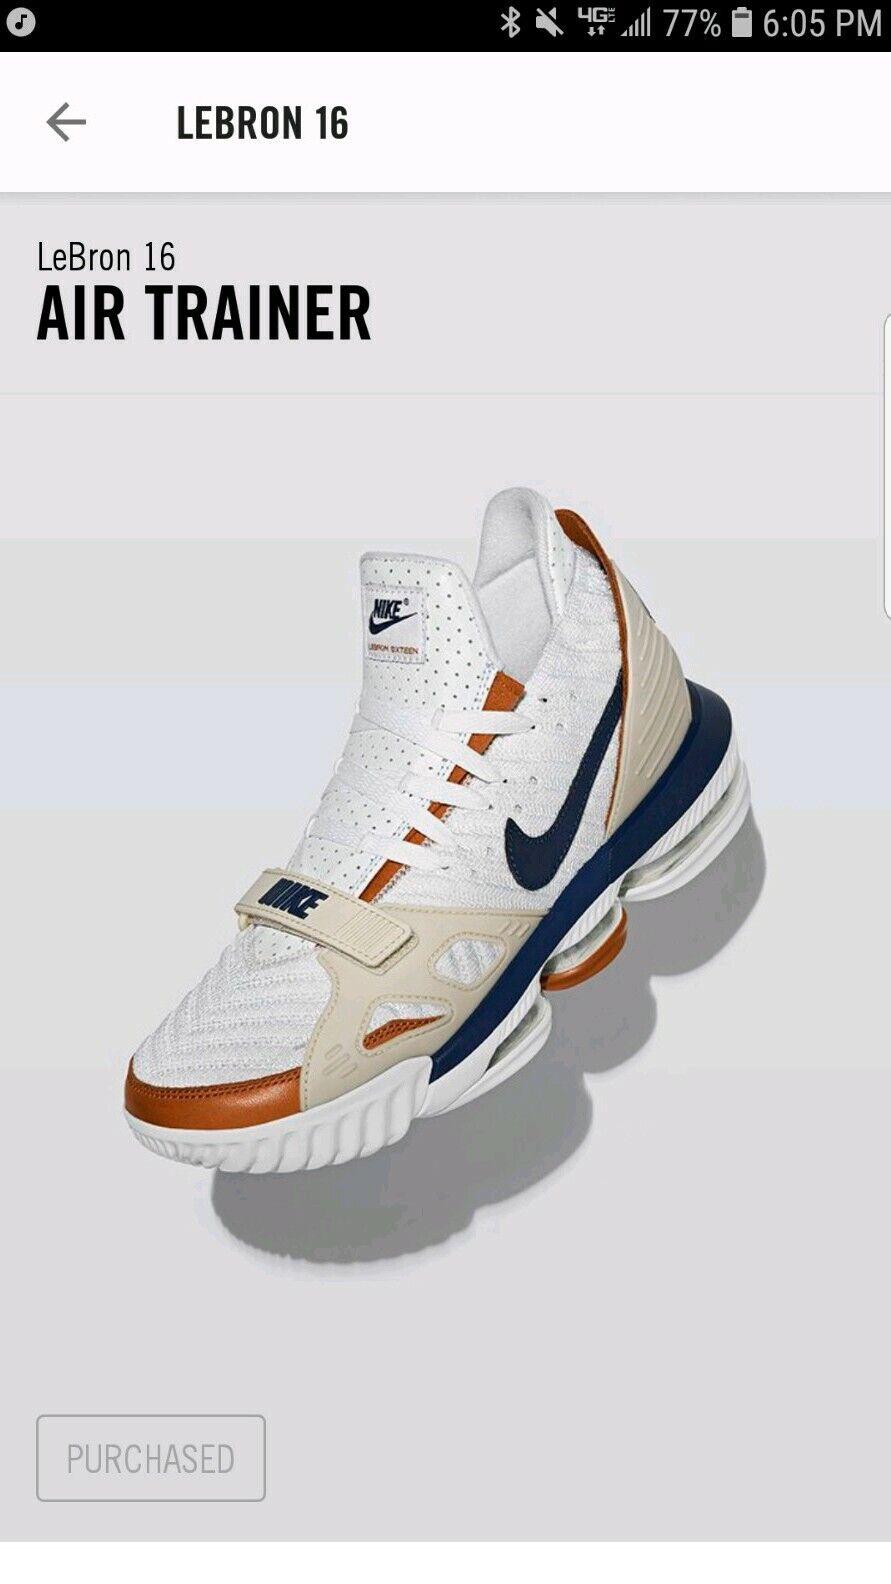 2019 Nike LeBron 16 Air Trainer 'Medicine Ball' CD7089-100SIZE 12 BO DeadStock